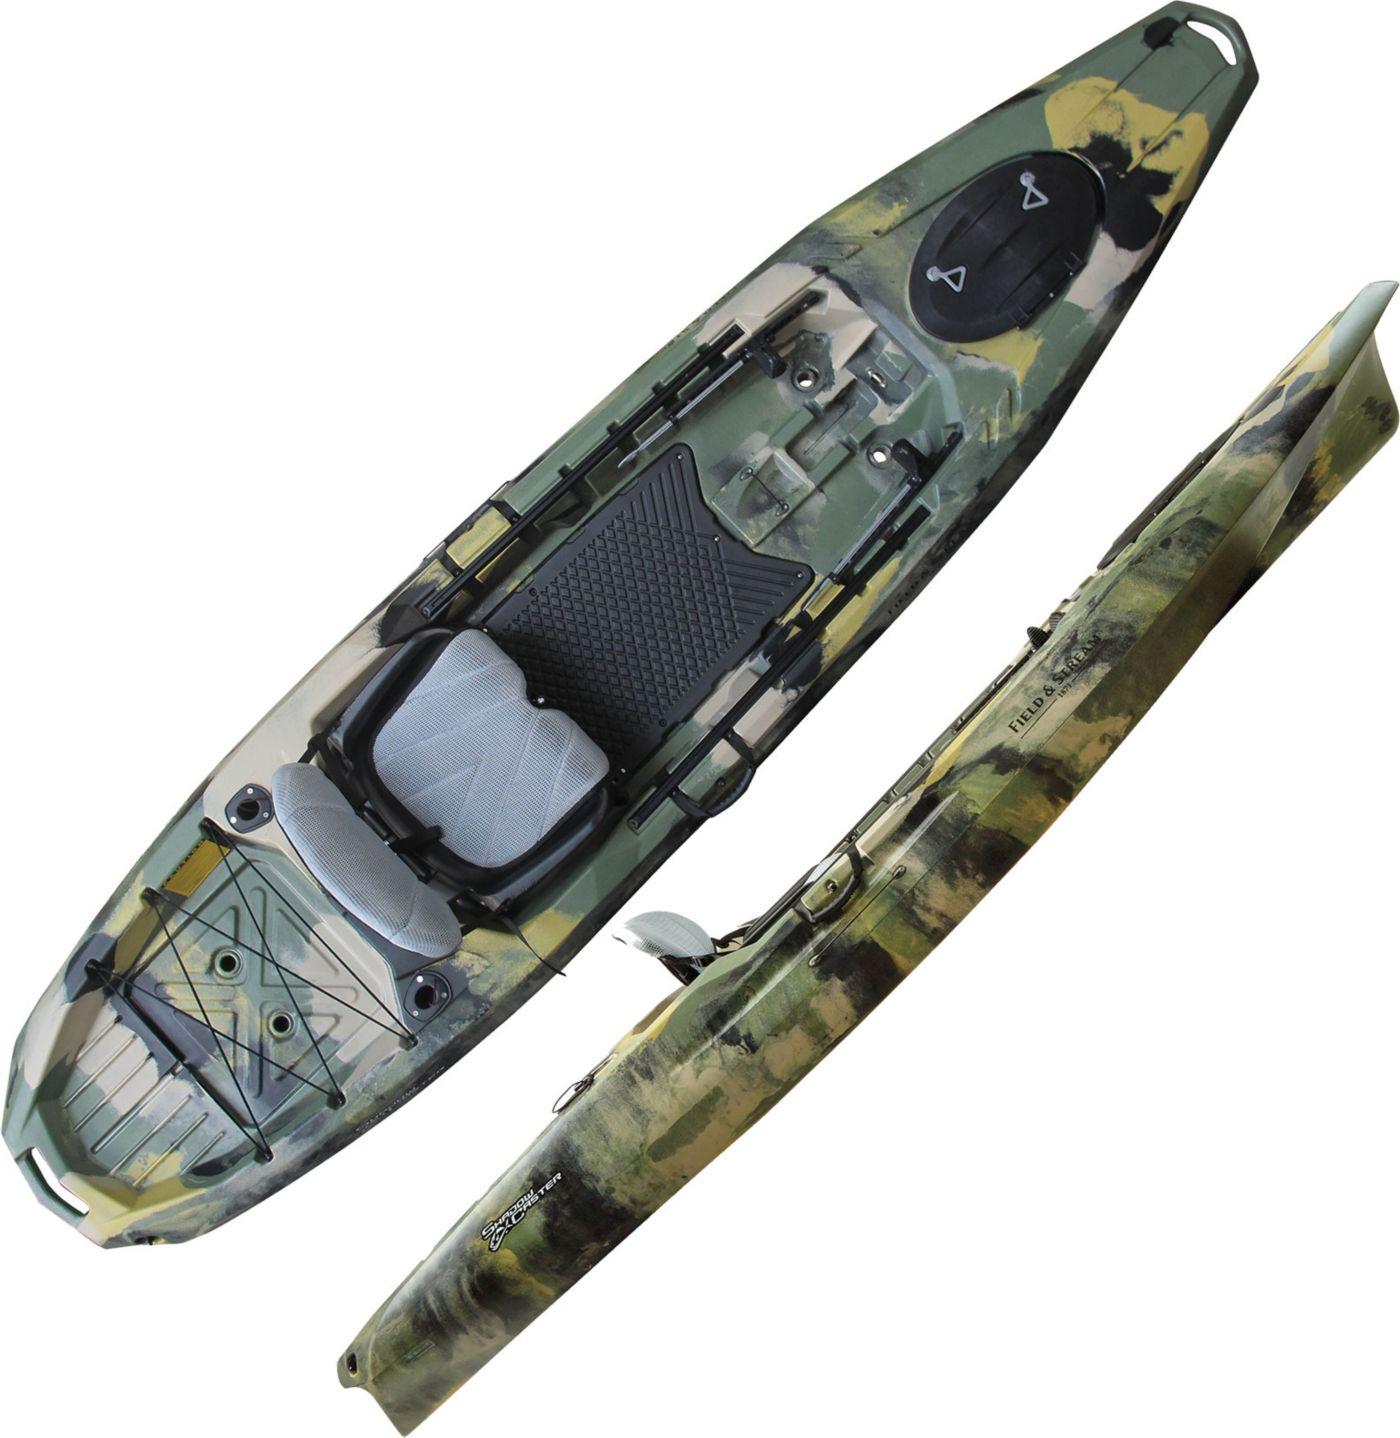 "Field & Stream Shadow Caster 12'3"" Angler Kayak"